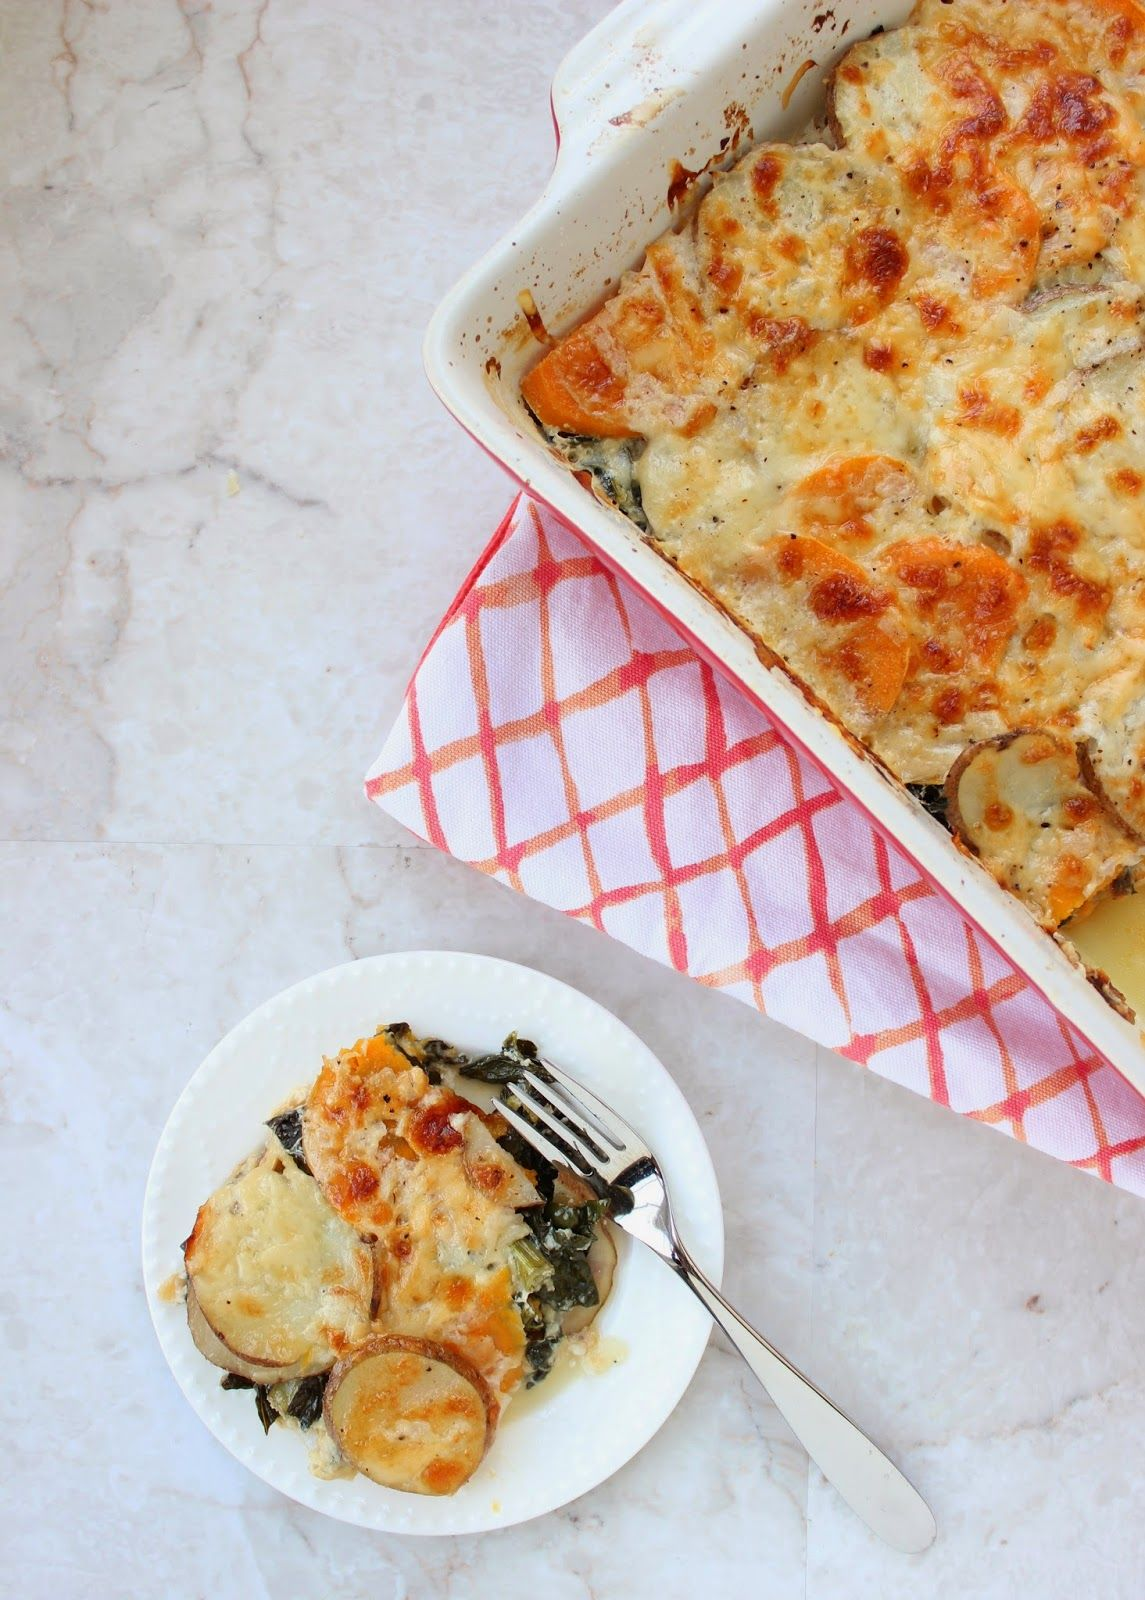 Stew or a Story: Mixed Potato & Kale Au Gratin